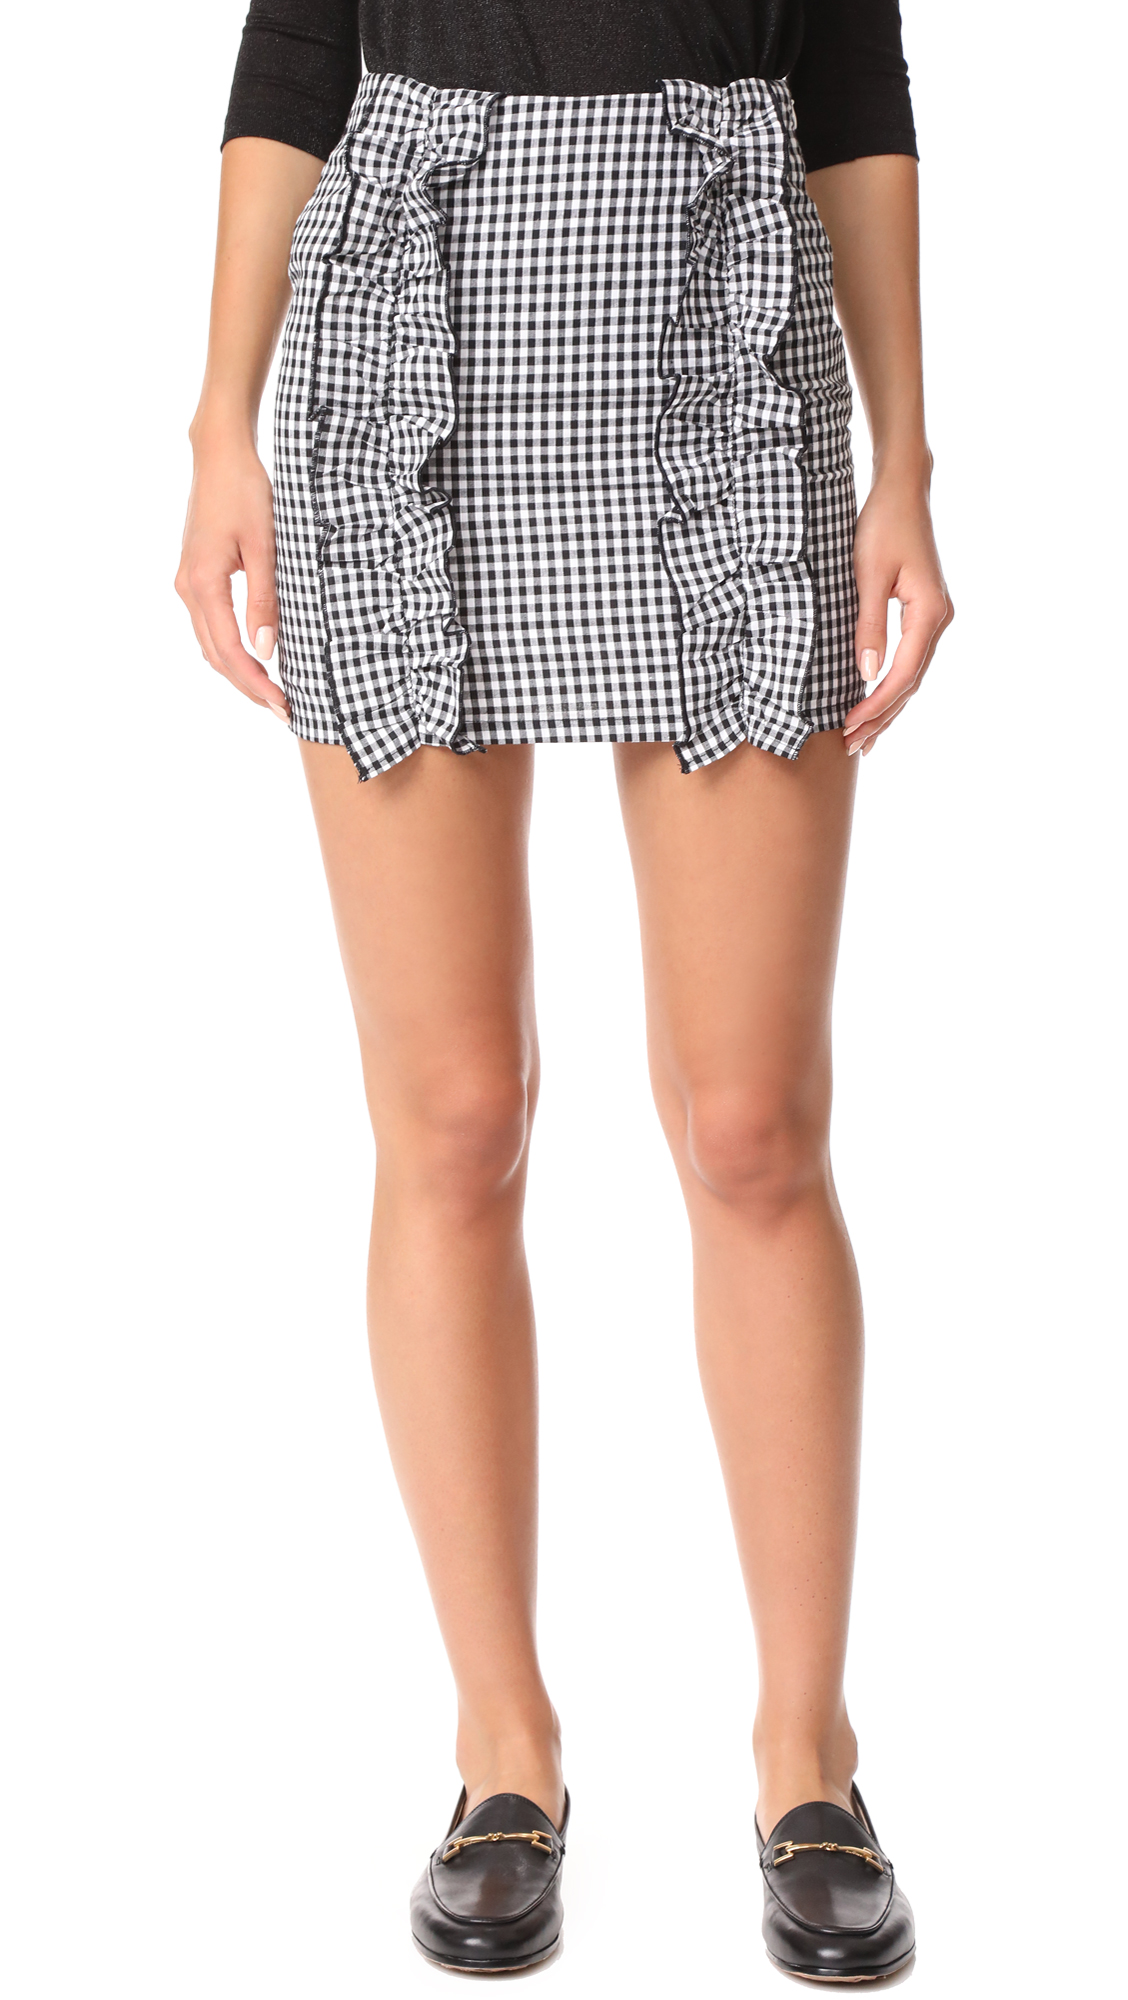 After Market Ruffle Mini Skirt - Black Gingham